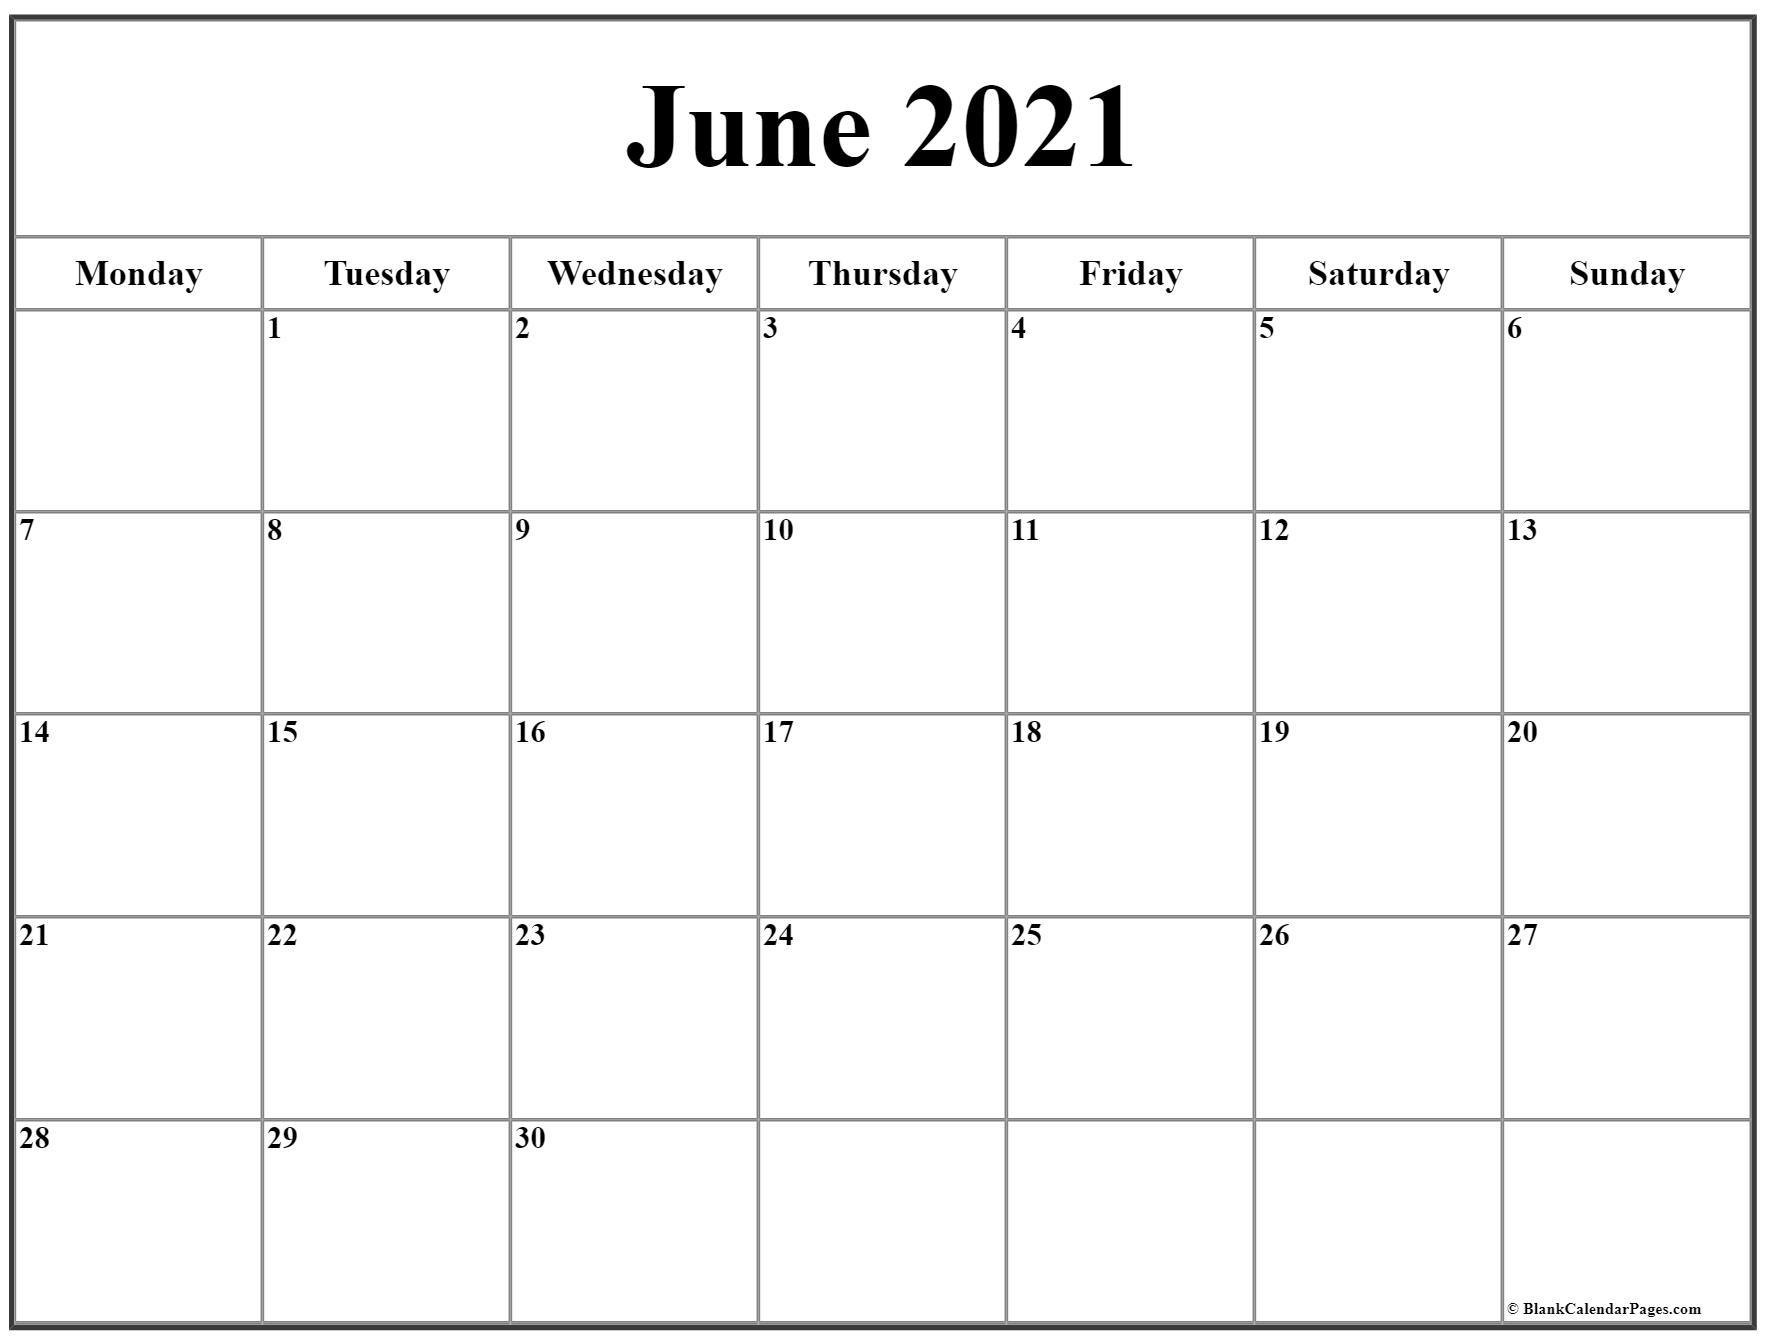 June 2021 Monday Calendar   Monday To Sunday